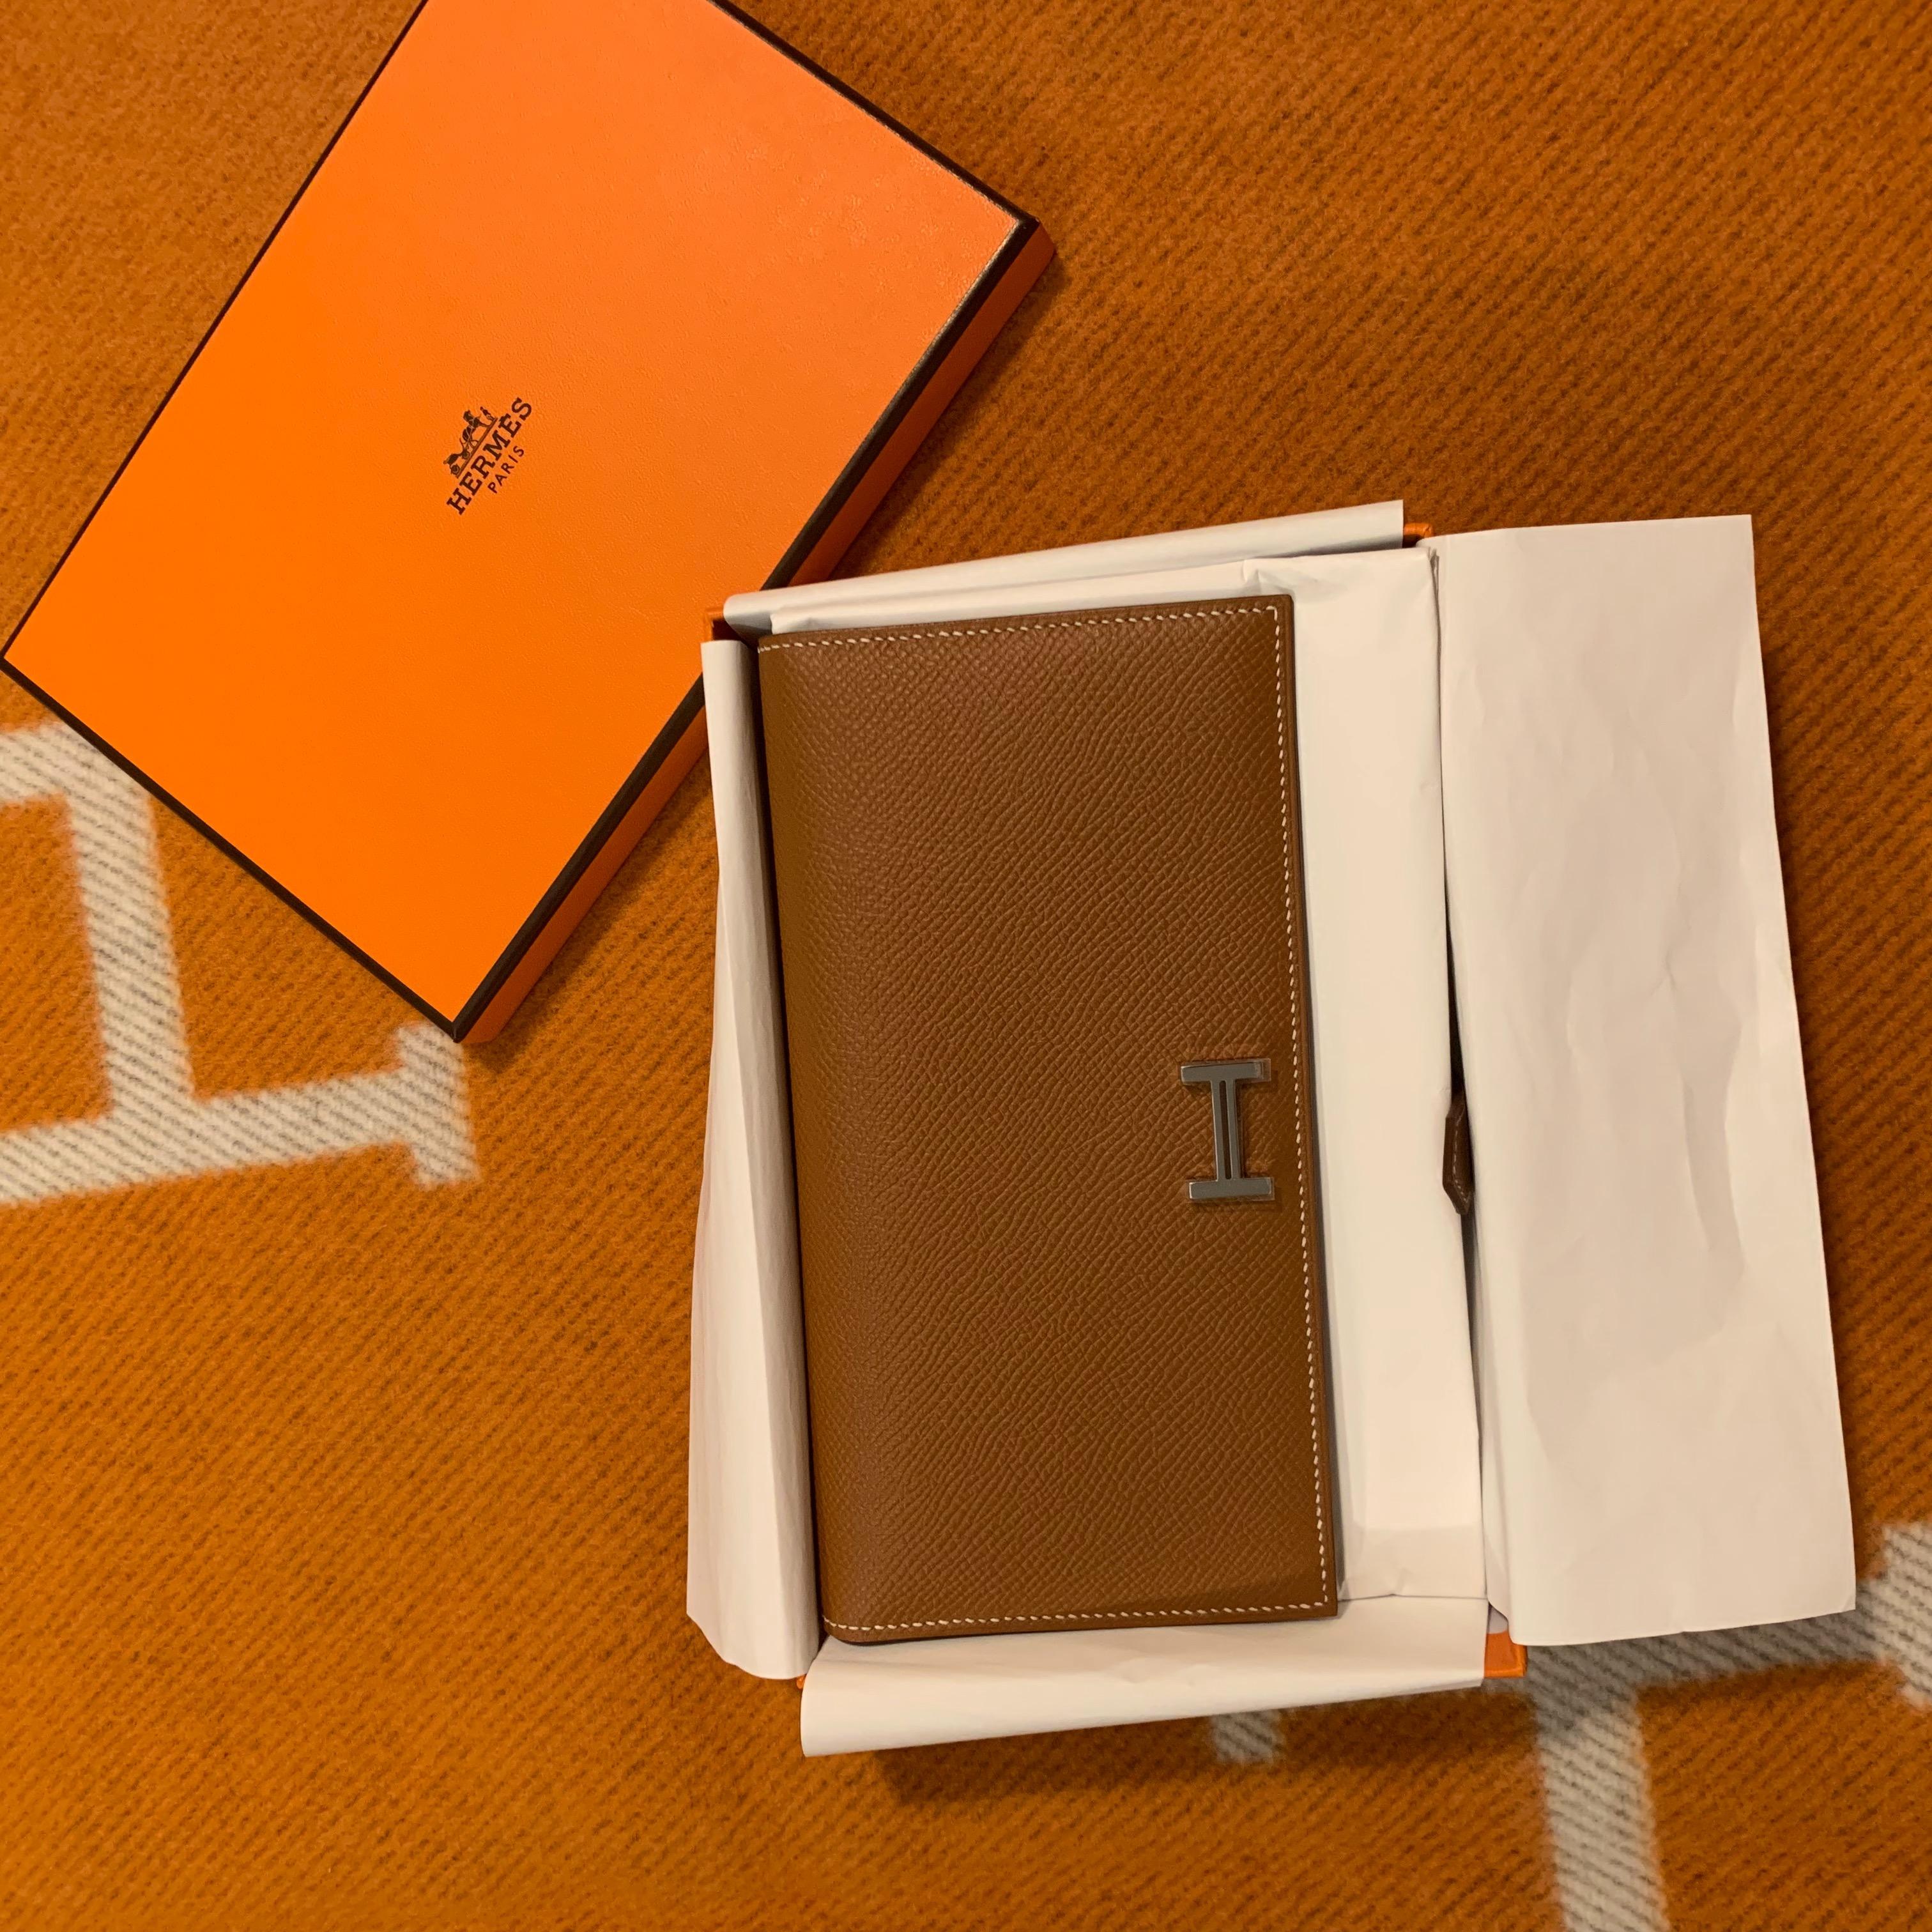 Hermes 愛馬仕 bearn長款金棕色銀扣長夾厚款epsom皮 配貨好價71500/個 台灣售92000 up